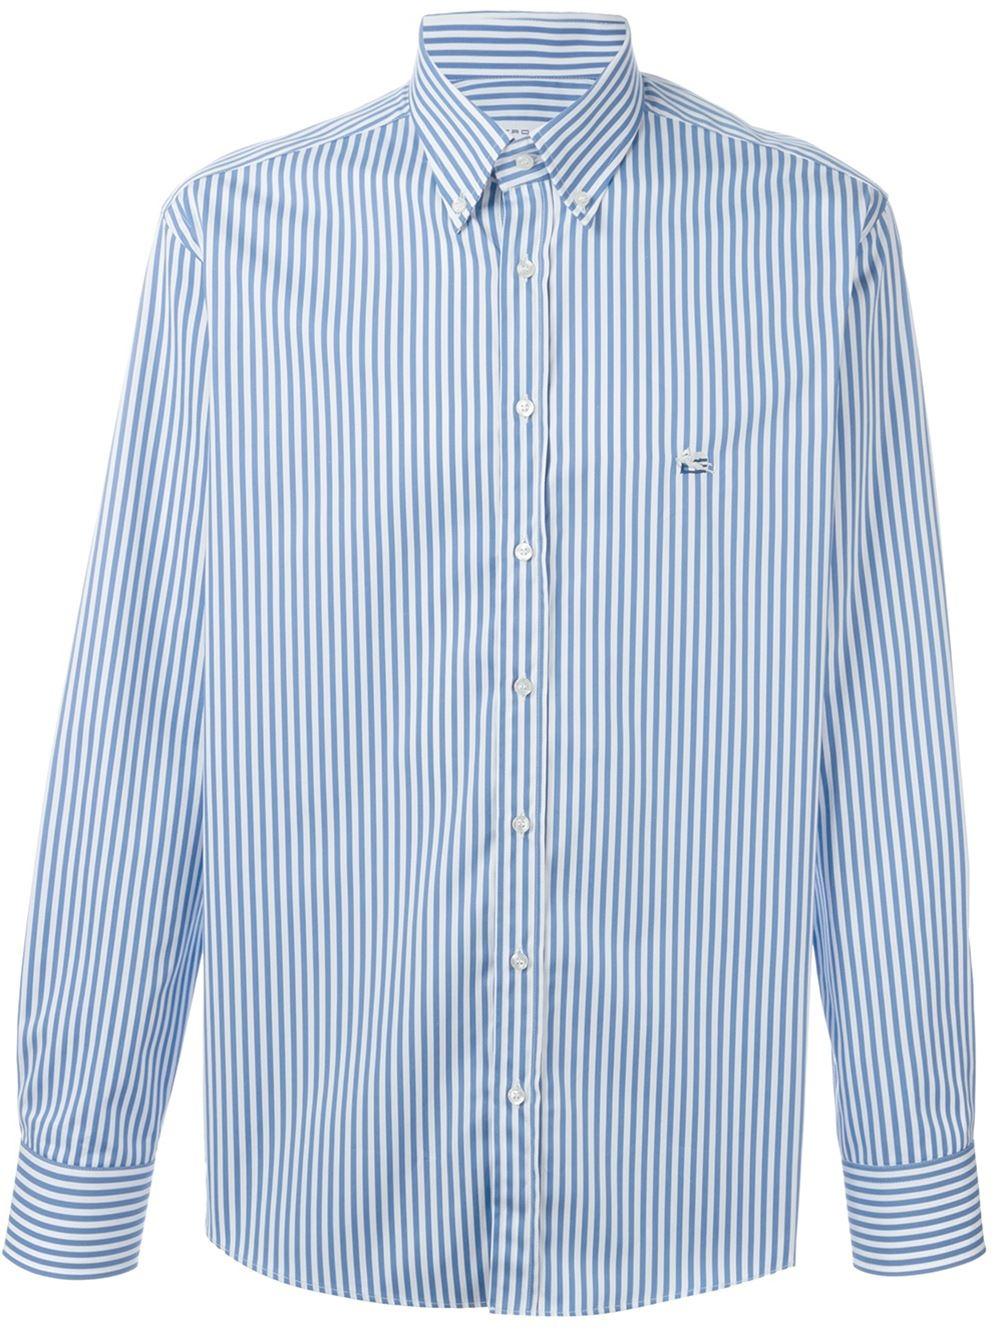 Lyst etro striped button down shirt in blue for men for Striped button down shirts for men